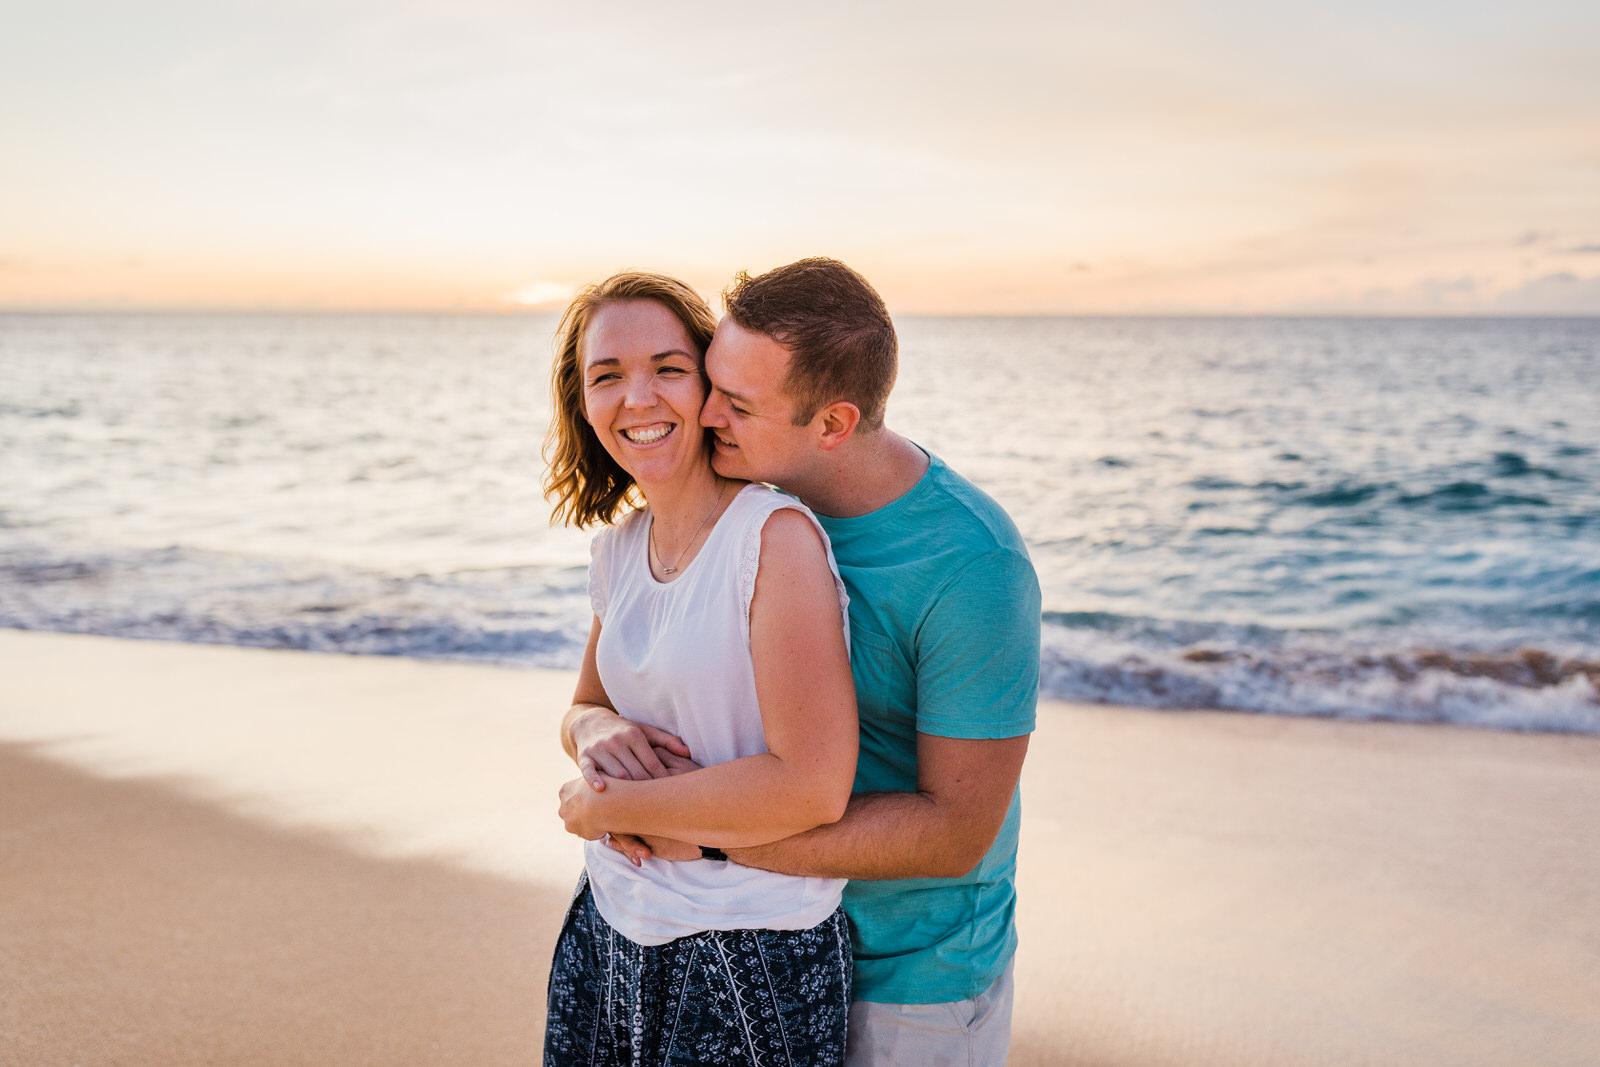 extended-family-big-island-vacation-cousins-grandparents-beach-waikoloa-sunset-hawaii-7357.jpg